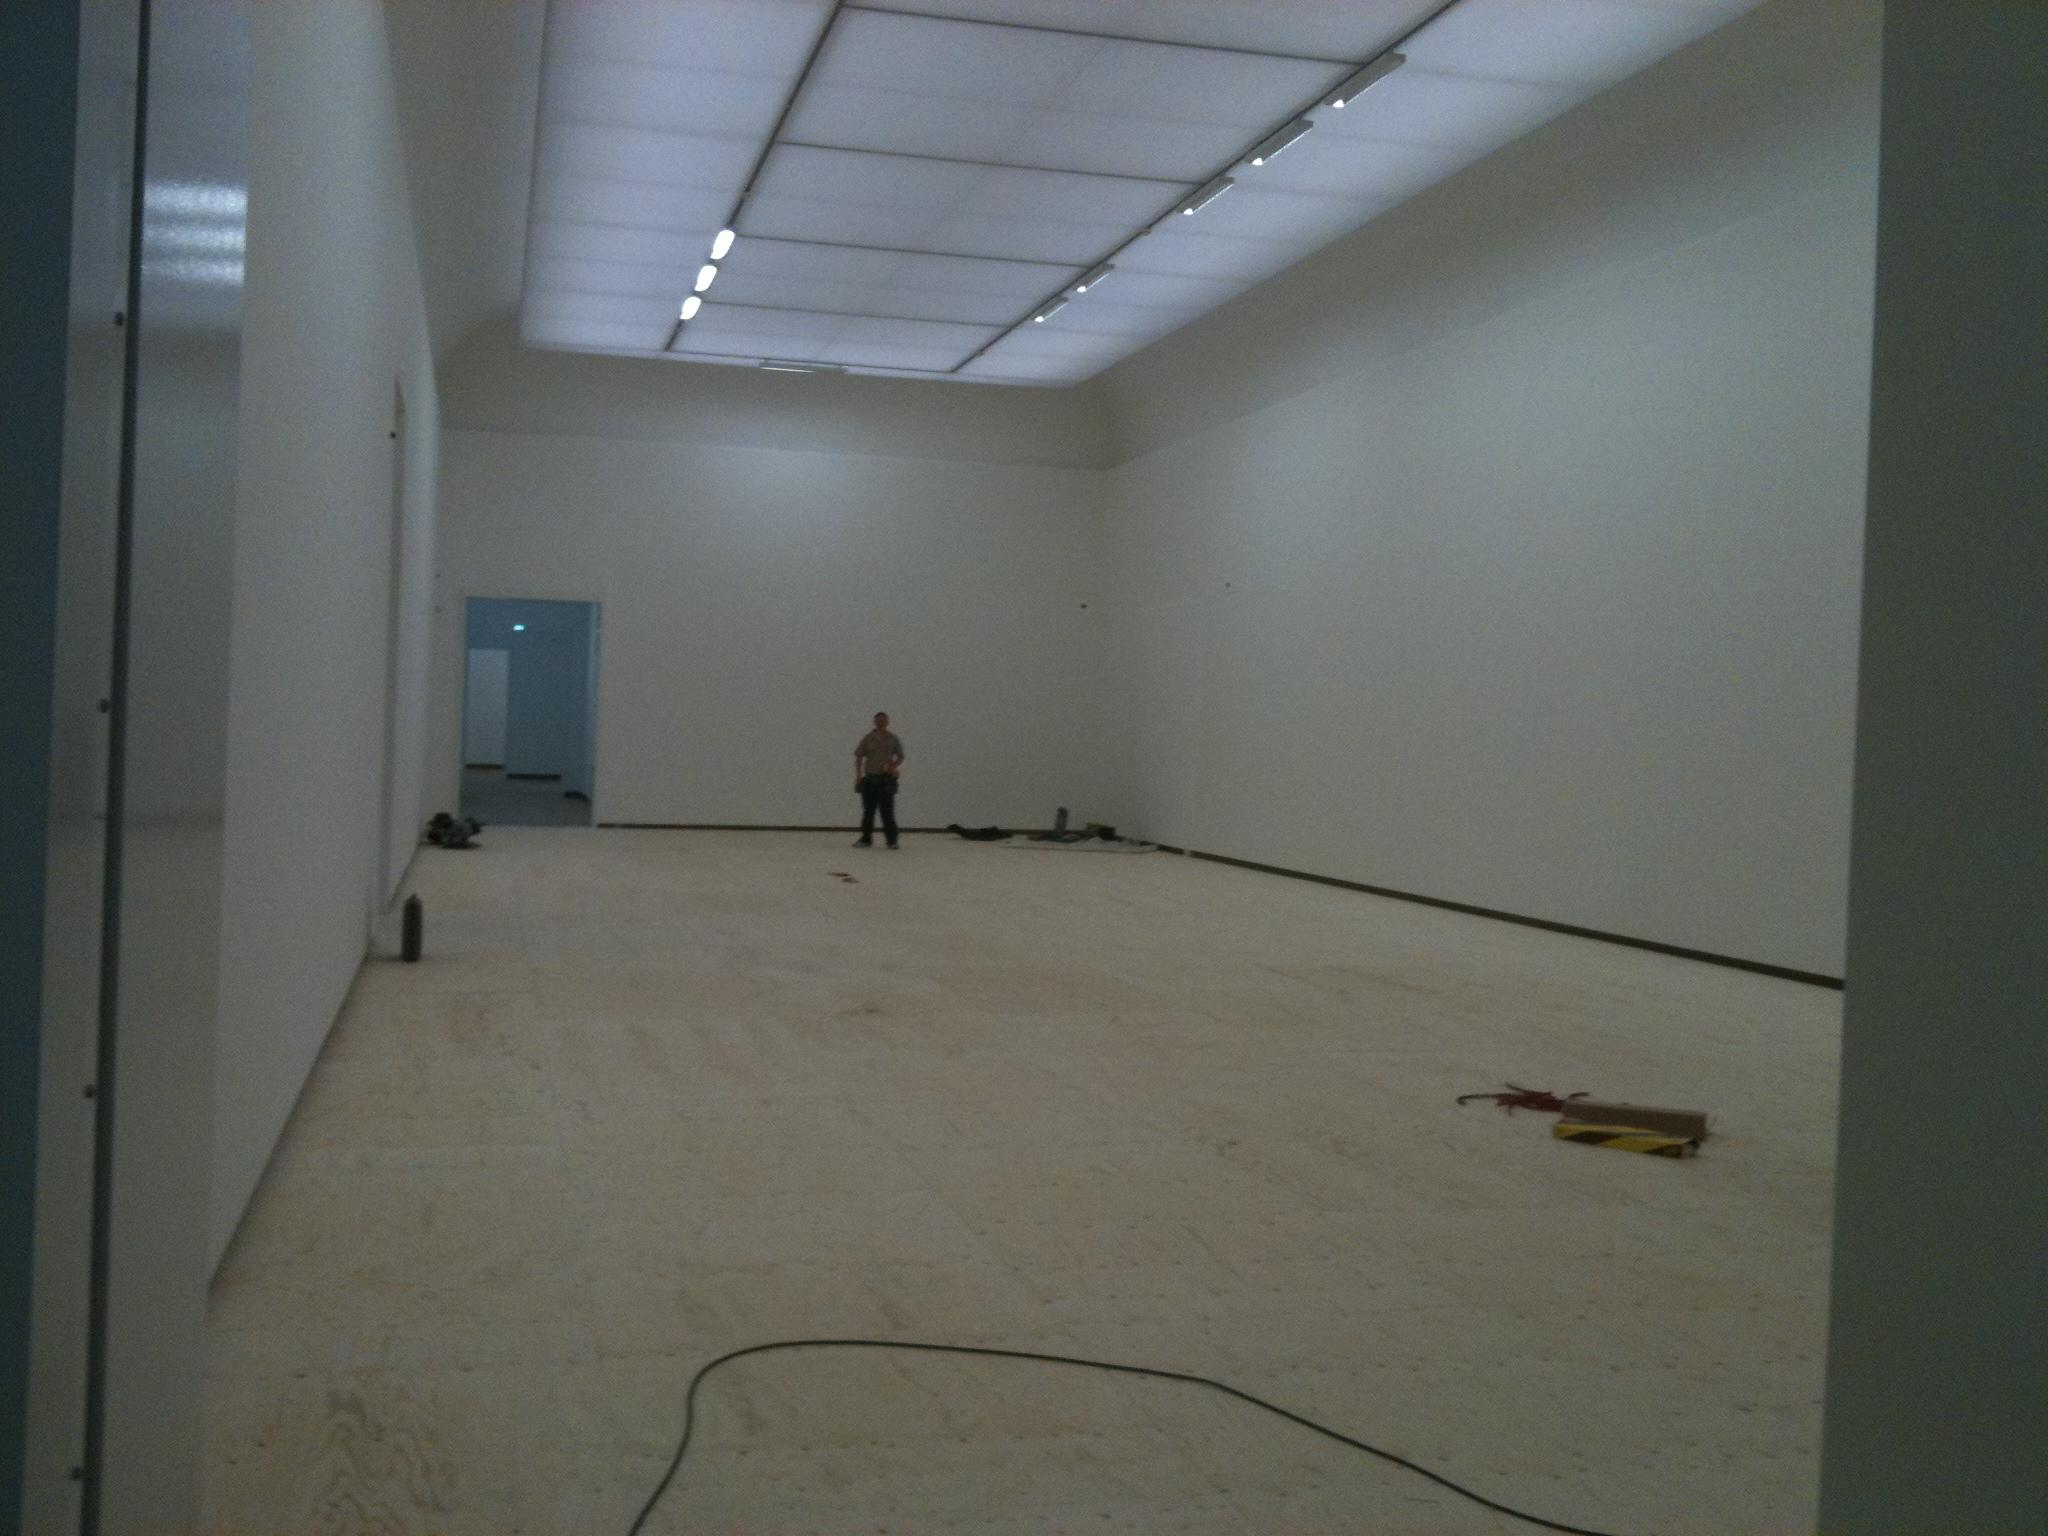 Timmerwerkzaamheden leggen vloer stedelijk Museum Amsterdam